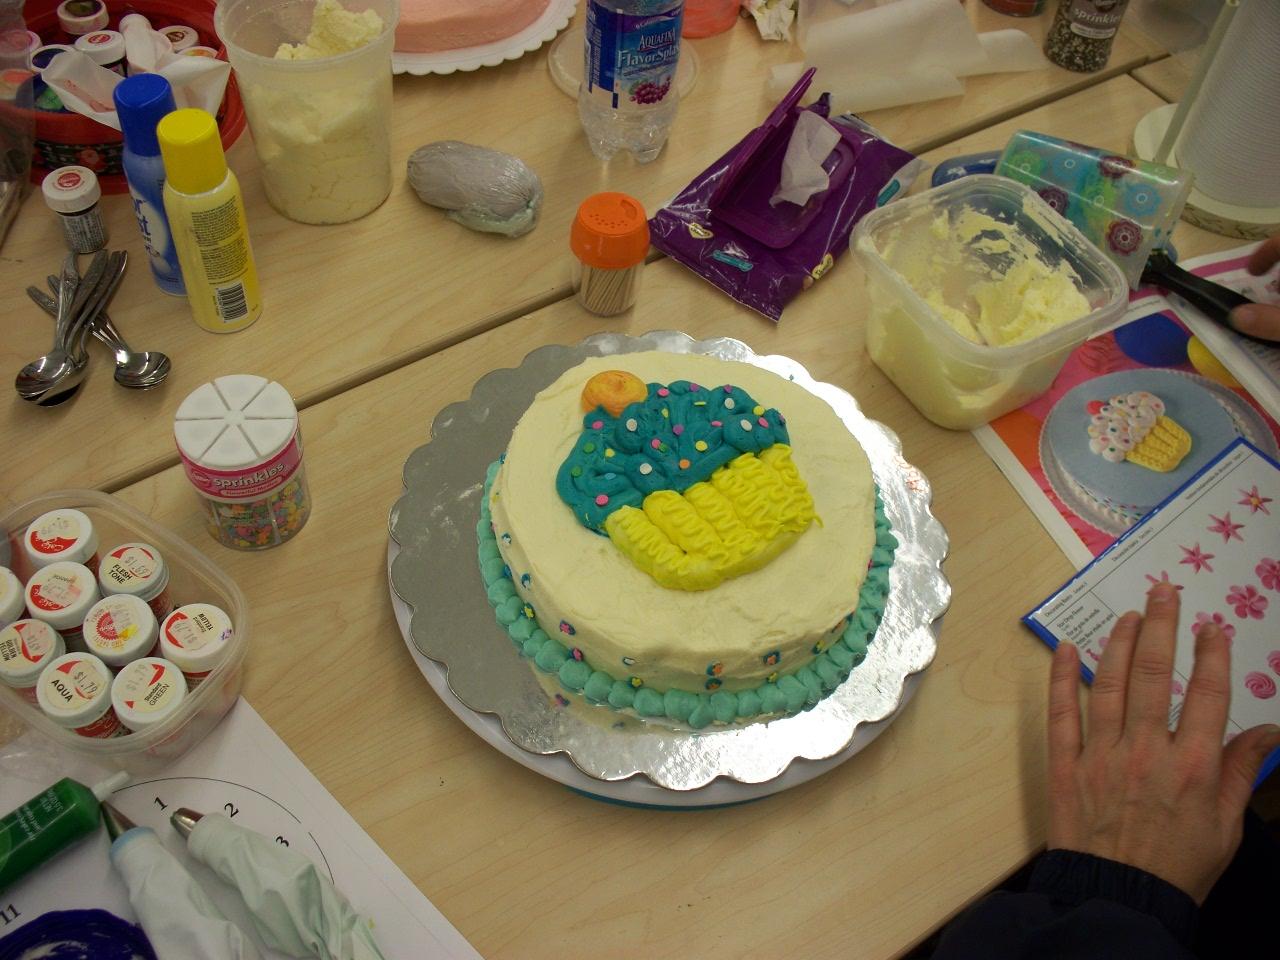 Joanns Cake Decorating Supplies